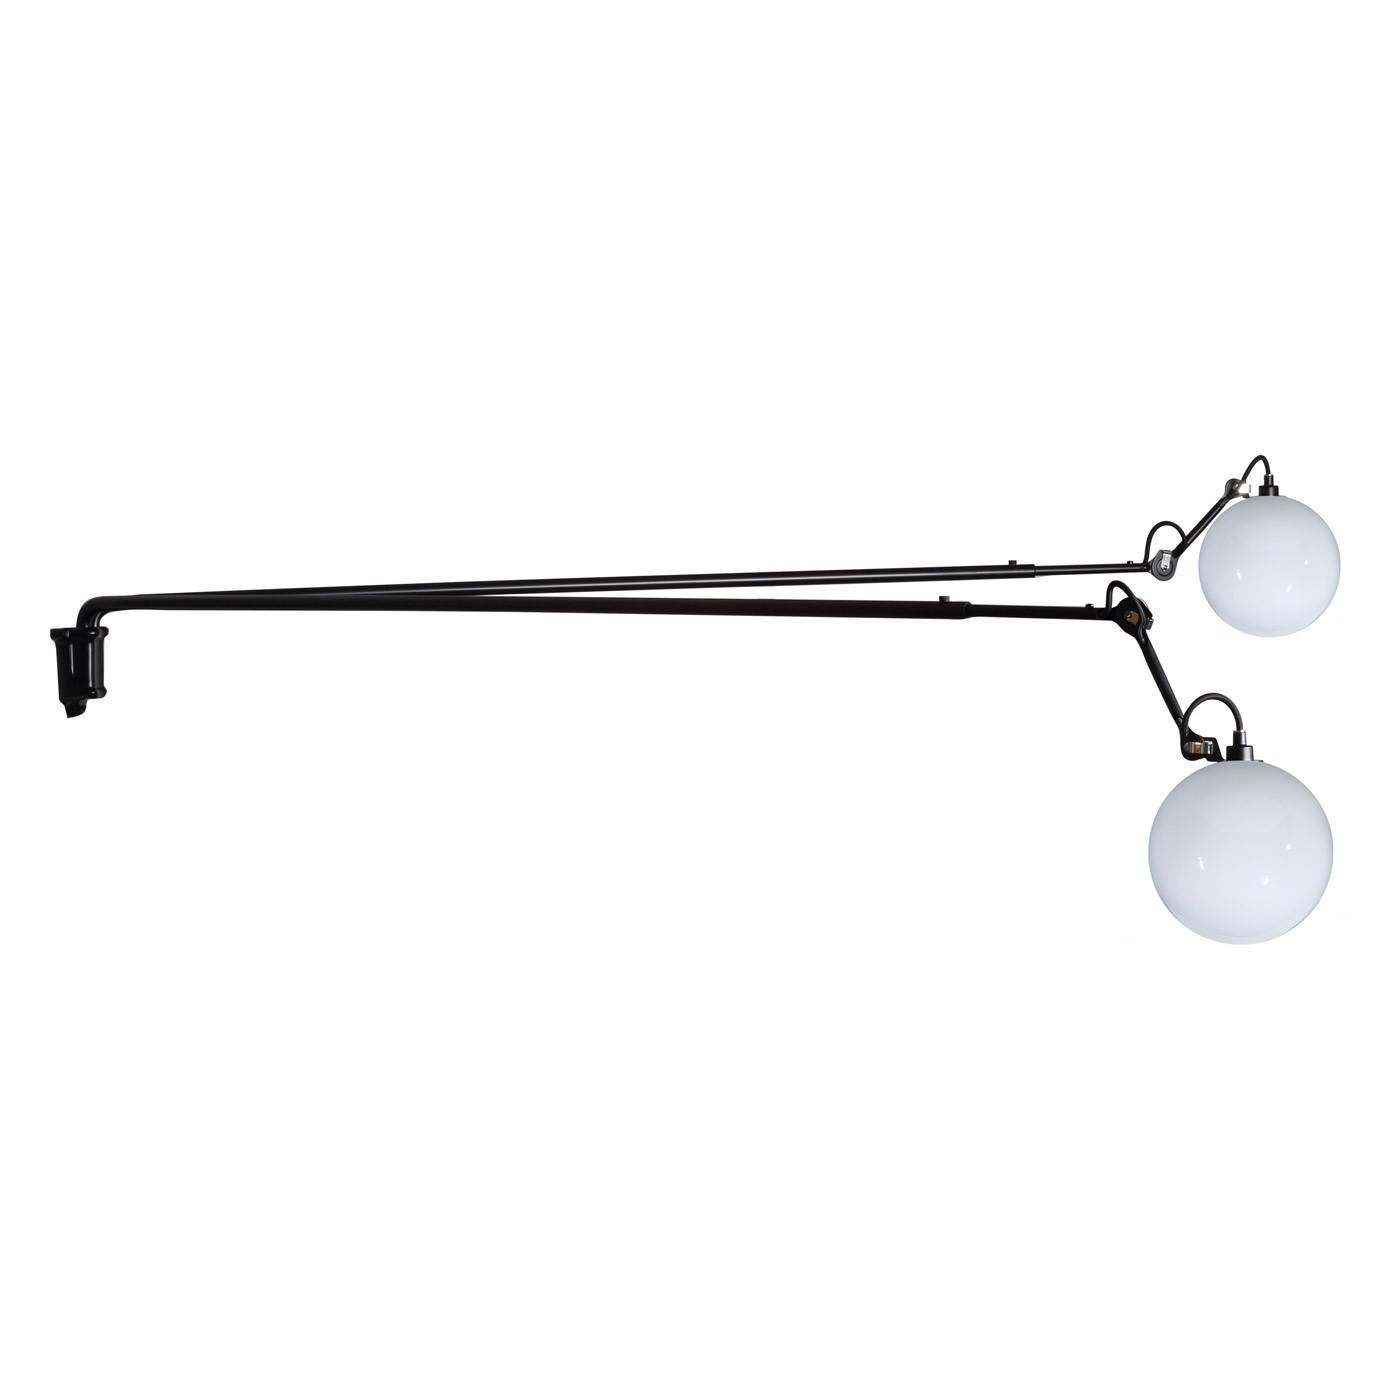 DCW Lampe Gras No 213 L Double Glass Ball 250